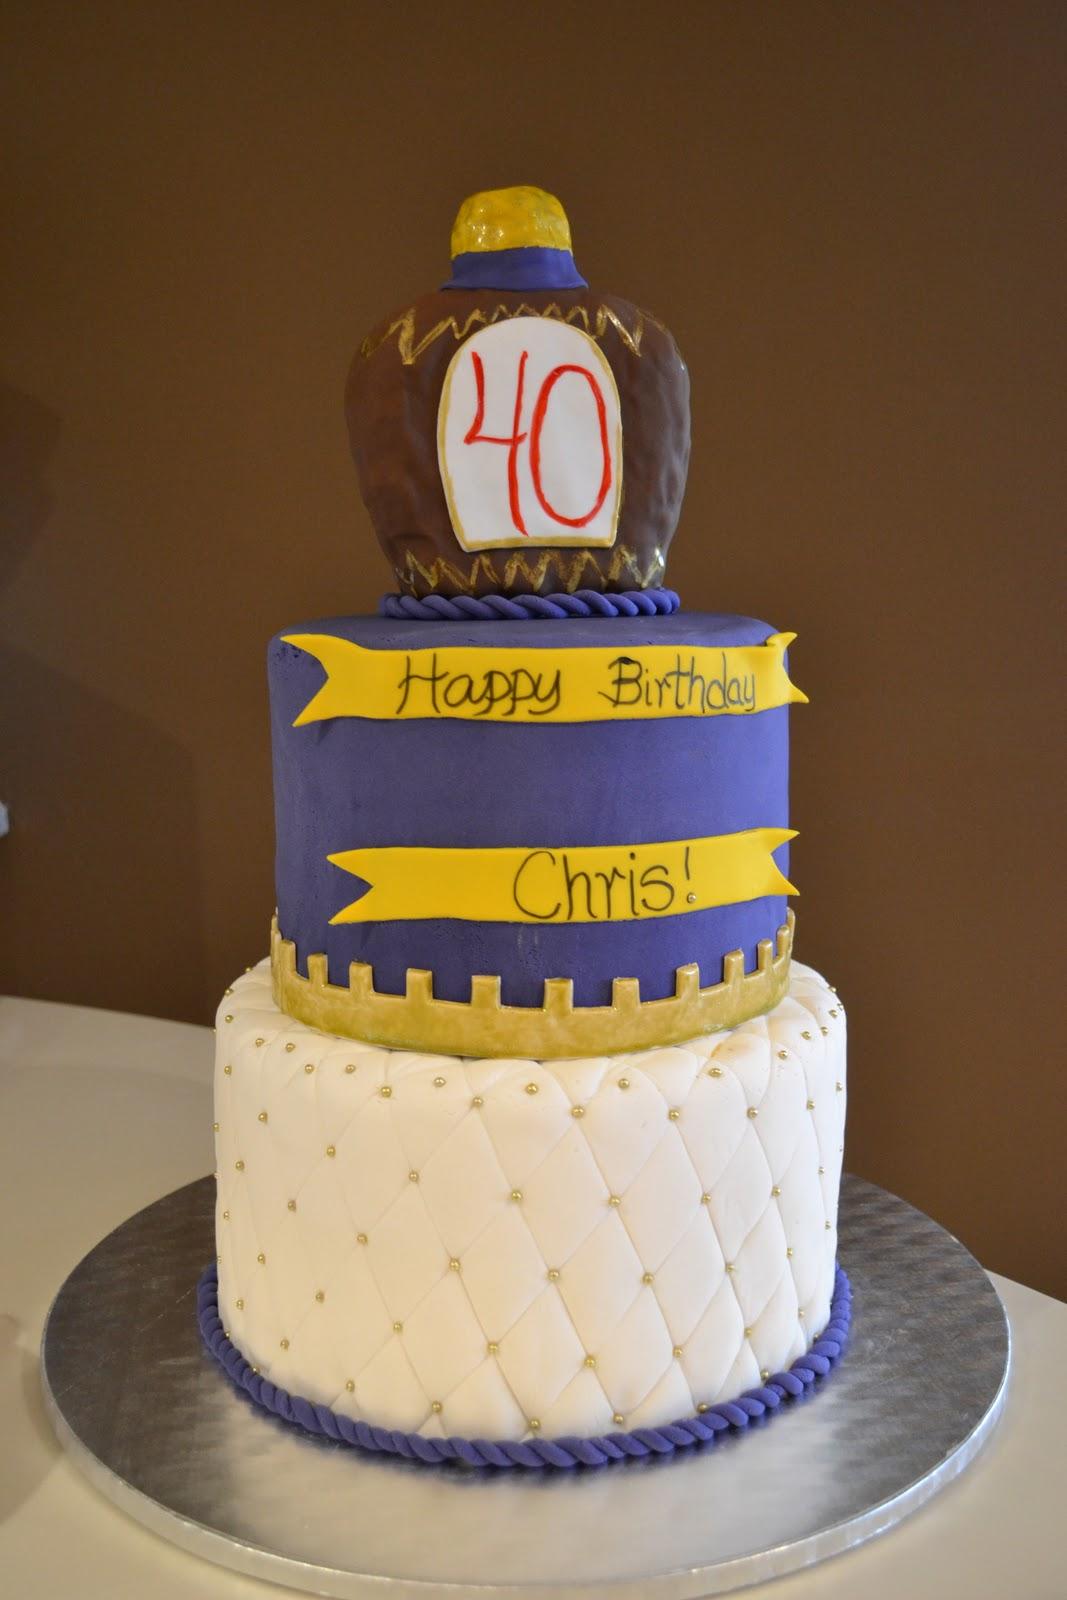 Lifes Sweet Crown Royal 40th Birthday Cake